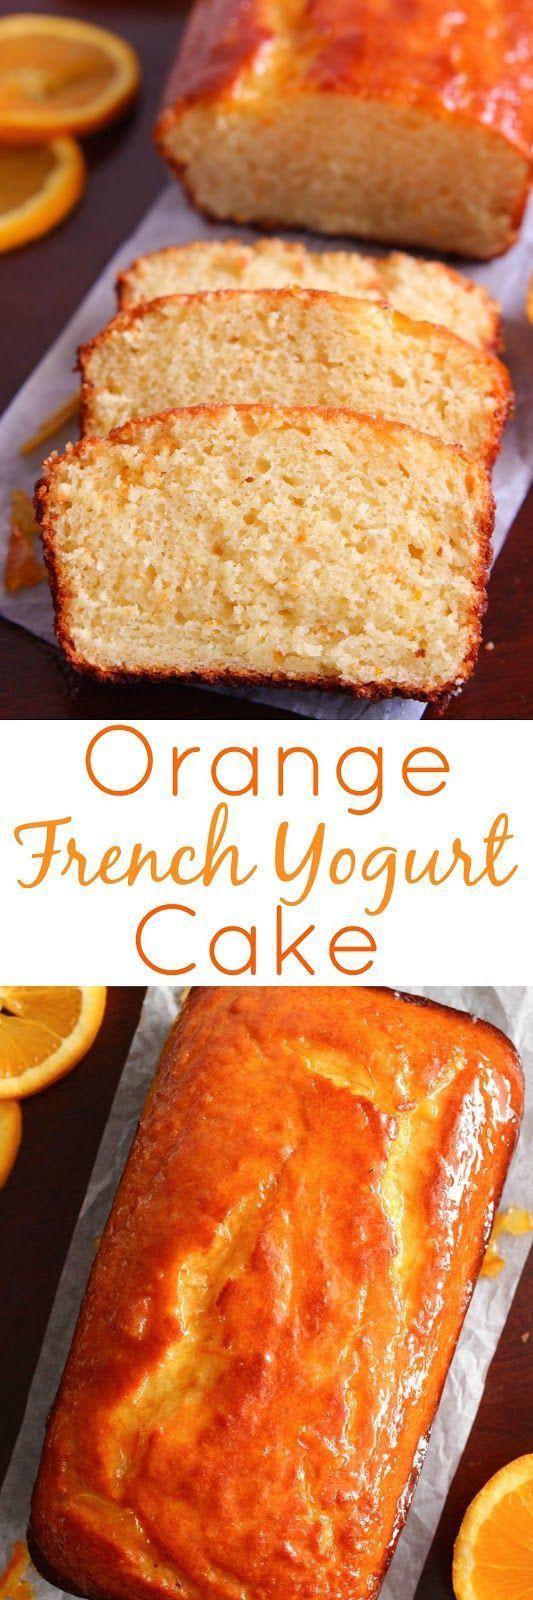 Eat Cake For Dinner: Orange French Yogurt Cake and Brunch at Bobby's Cookbook Review